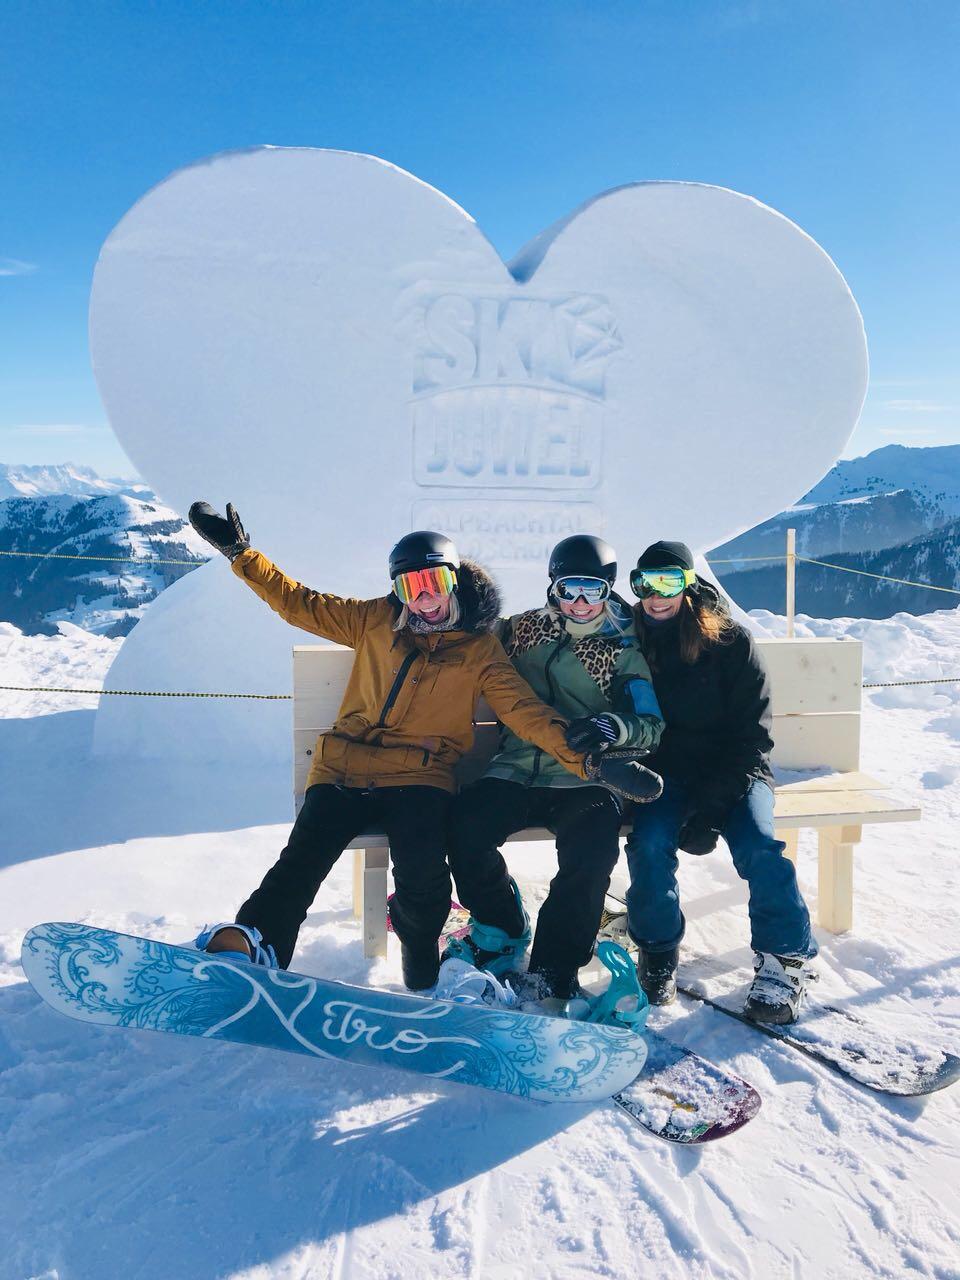 Skigebiet-Alpbachtal-Wildschönau-Ski-Juwel-Schneeskulptur-Miss-ahoi-Friends